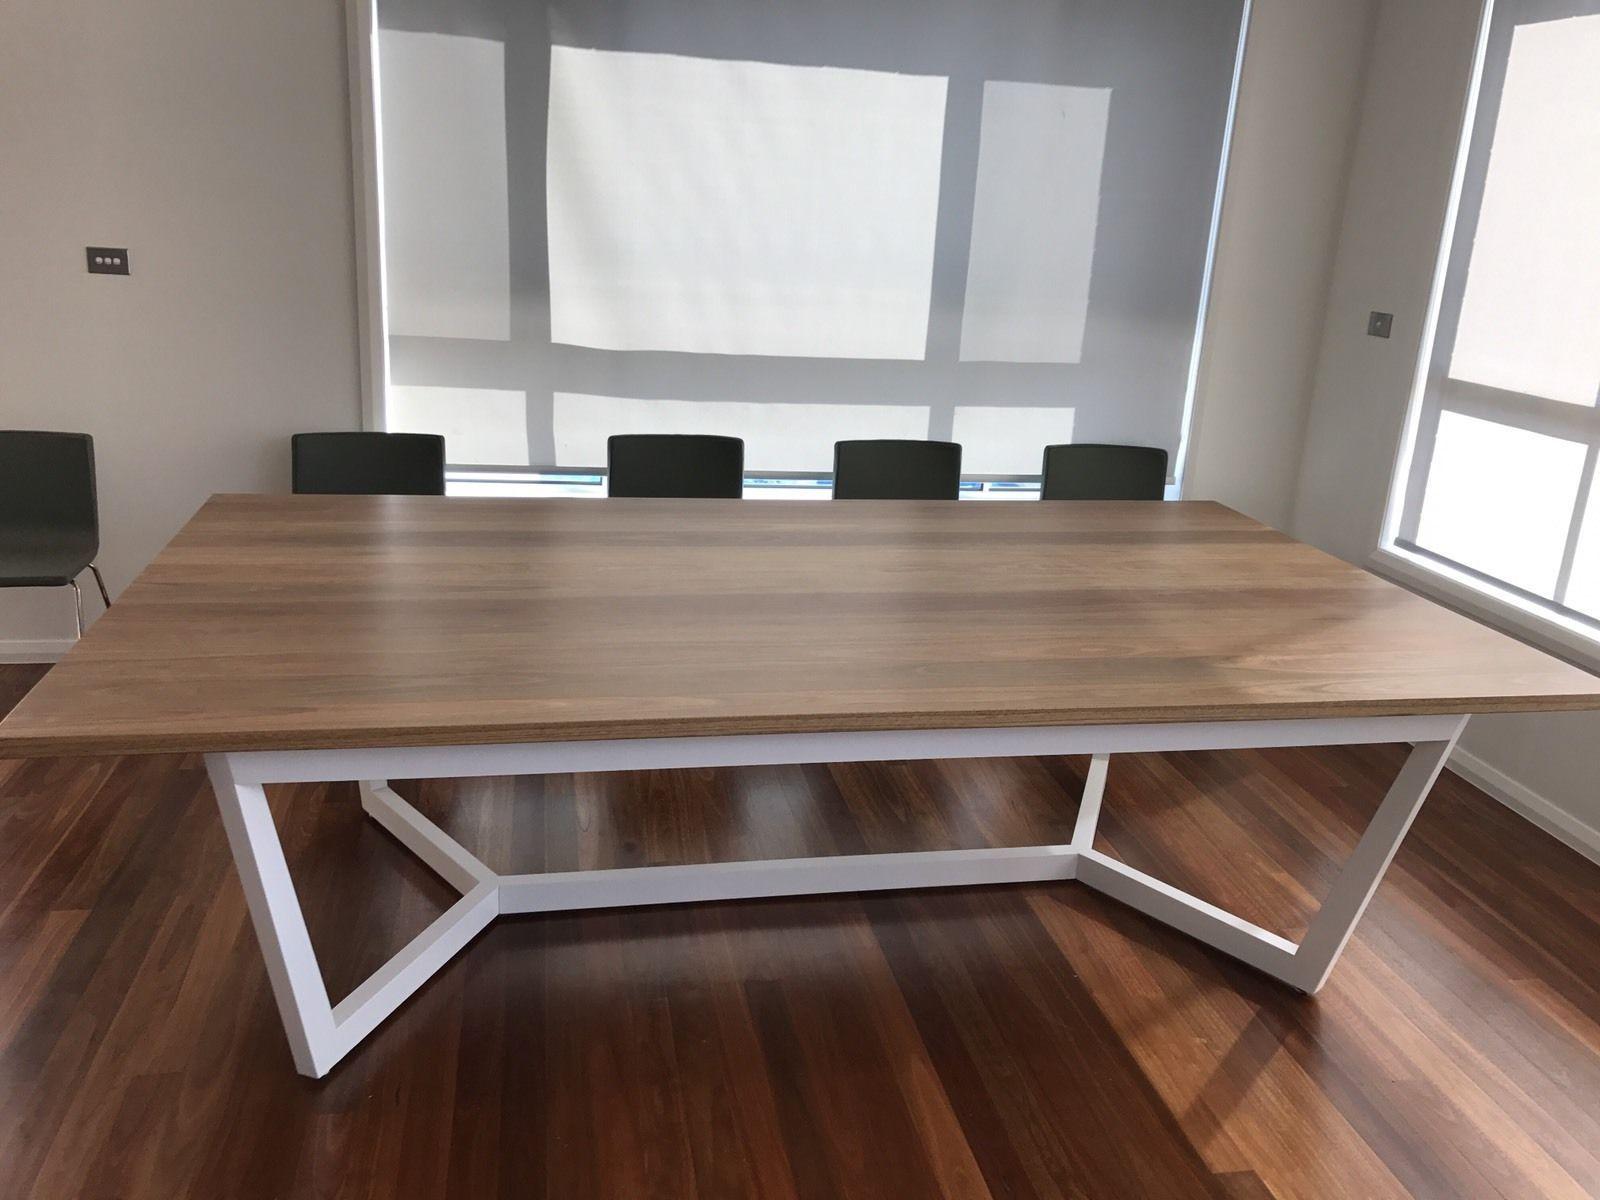 Hardwood Balgowlah Dining Table